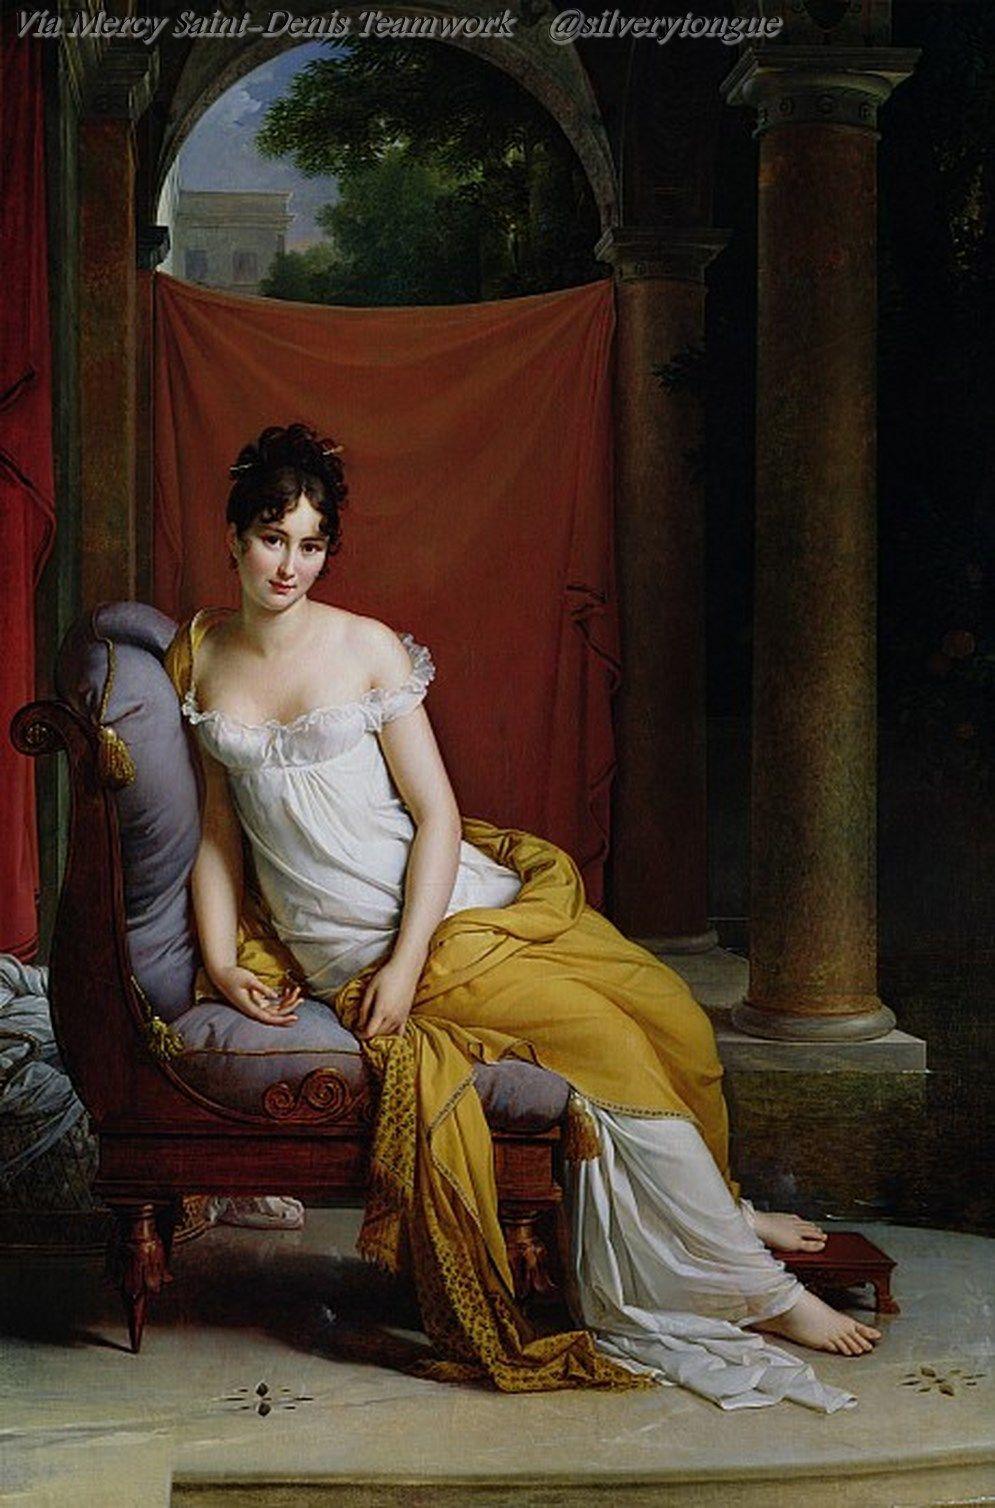 Portrait of Madame Recamier by Francois Gerard 1802.